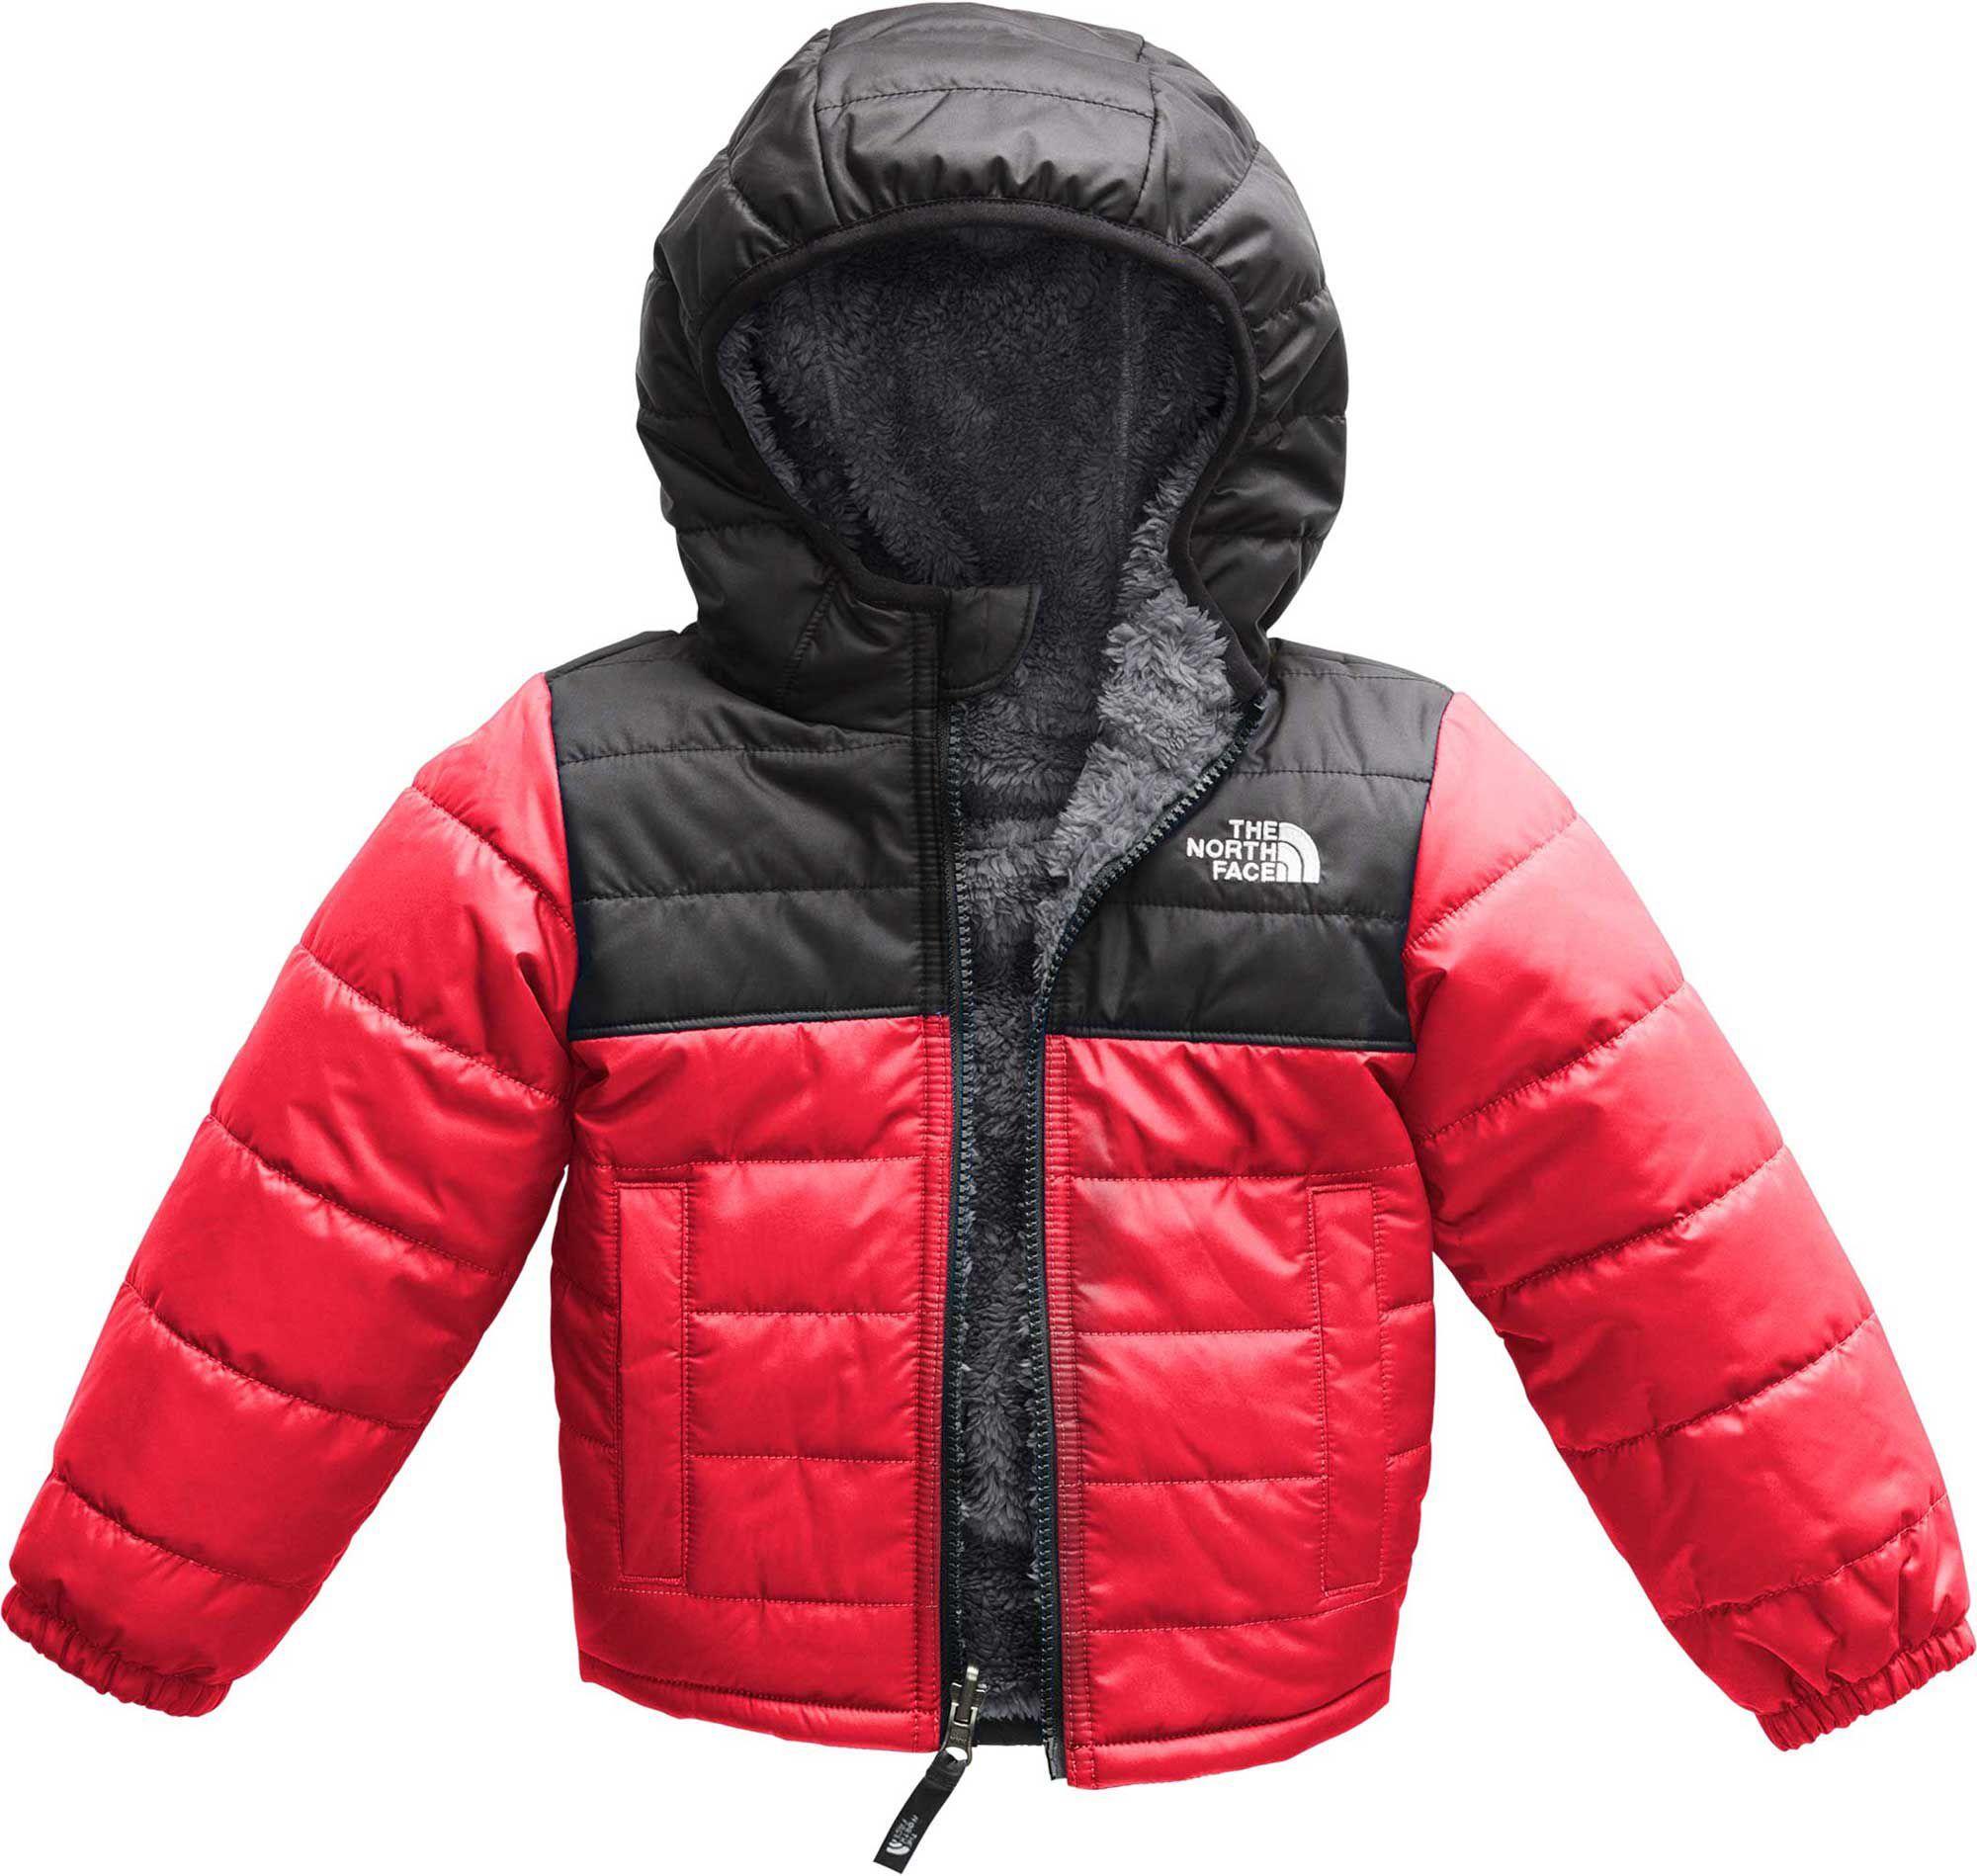 15b77db65 The North Face Toddler Boys' Mount Chimborazo Reversible Jacket in ...